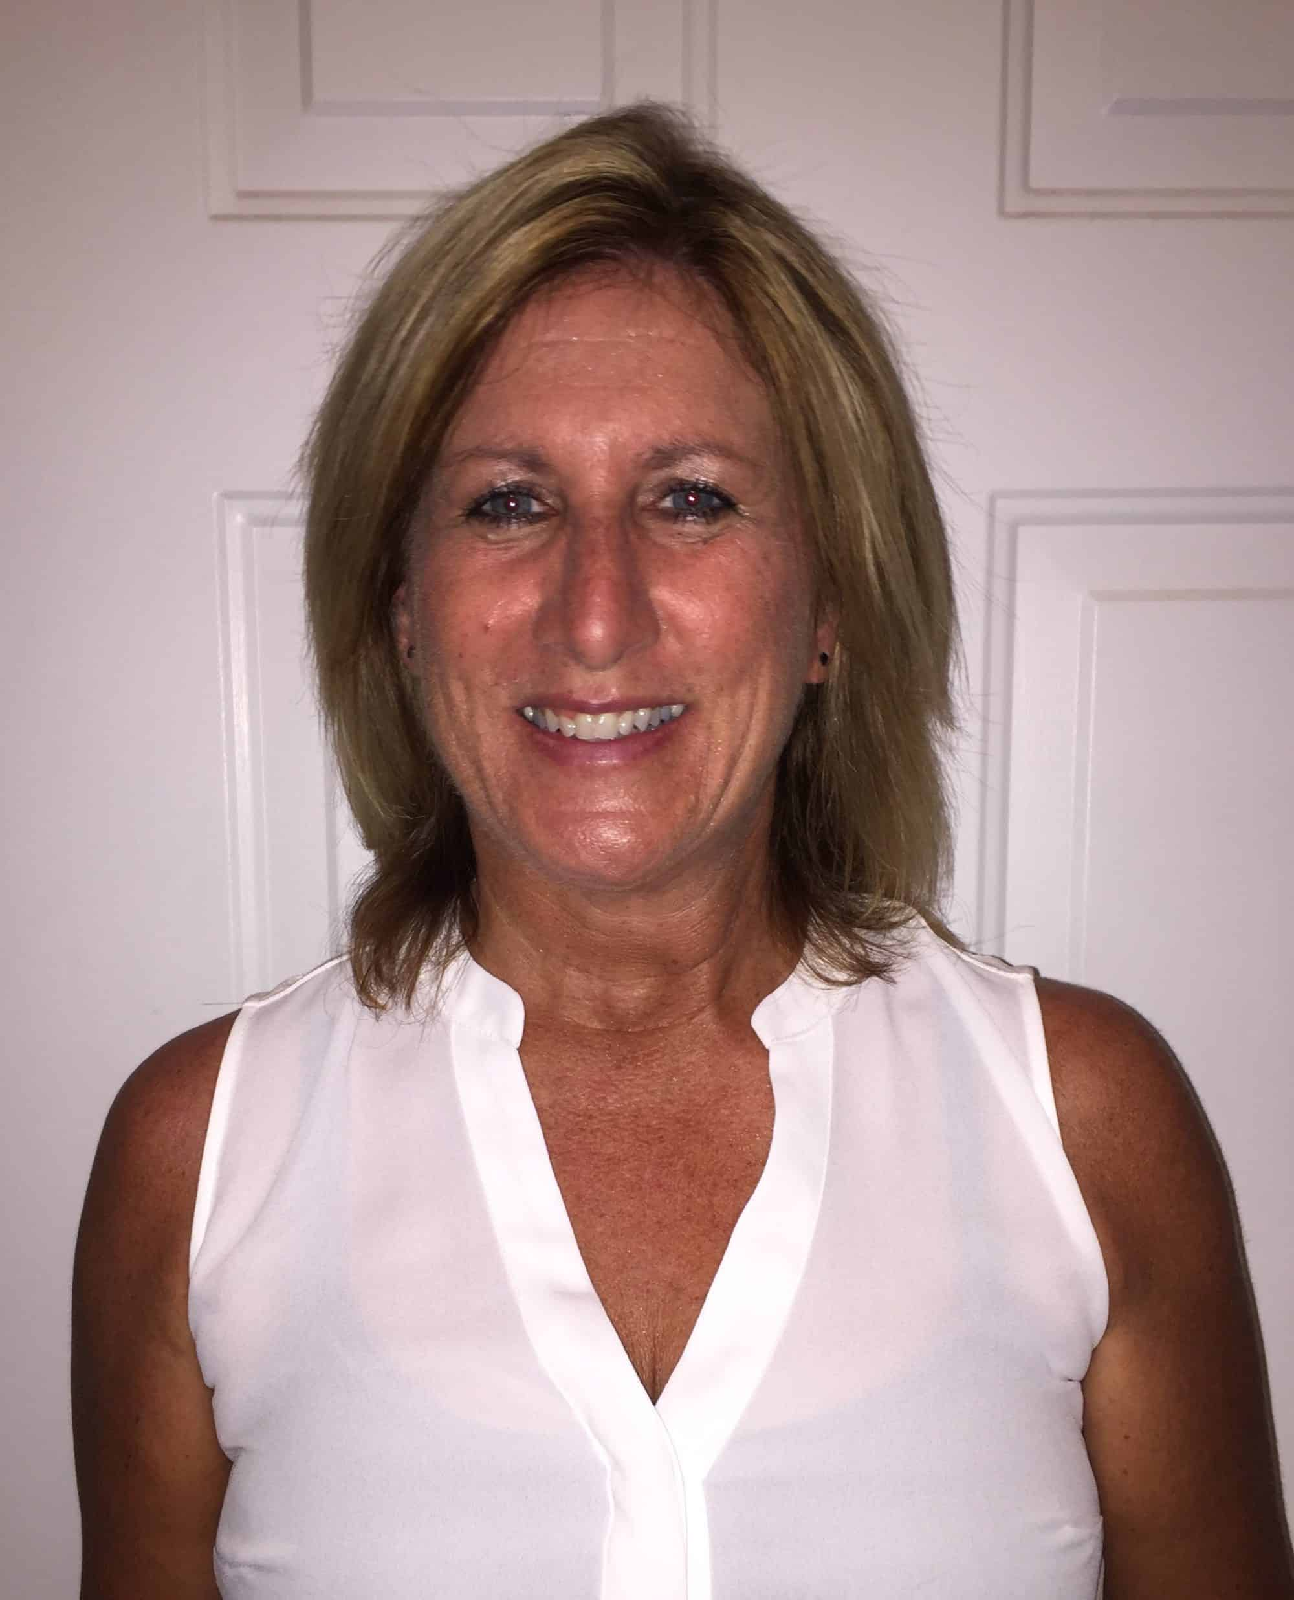 Kathy Mann Fit In 30 Studio